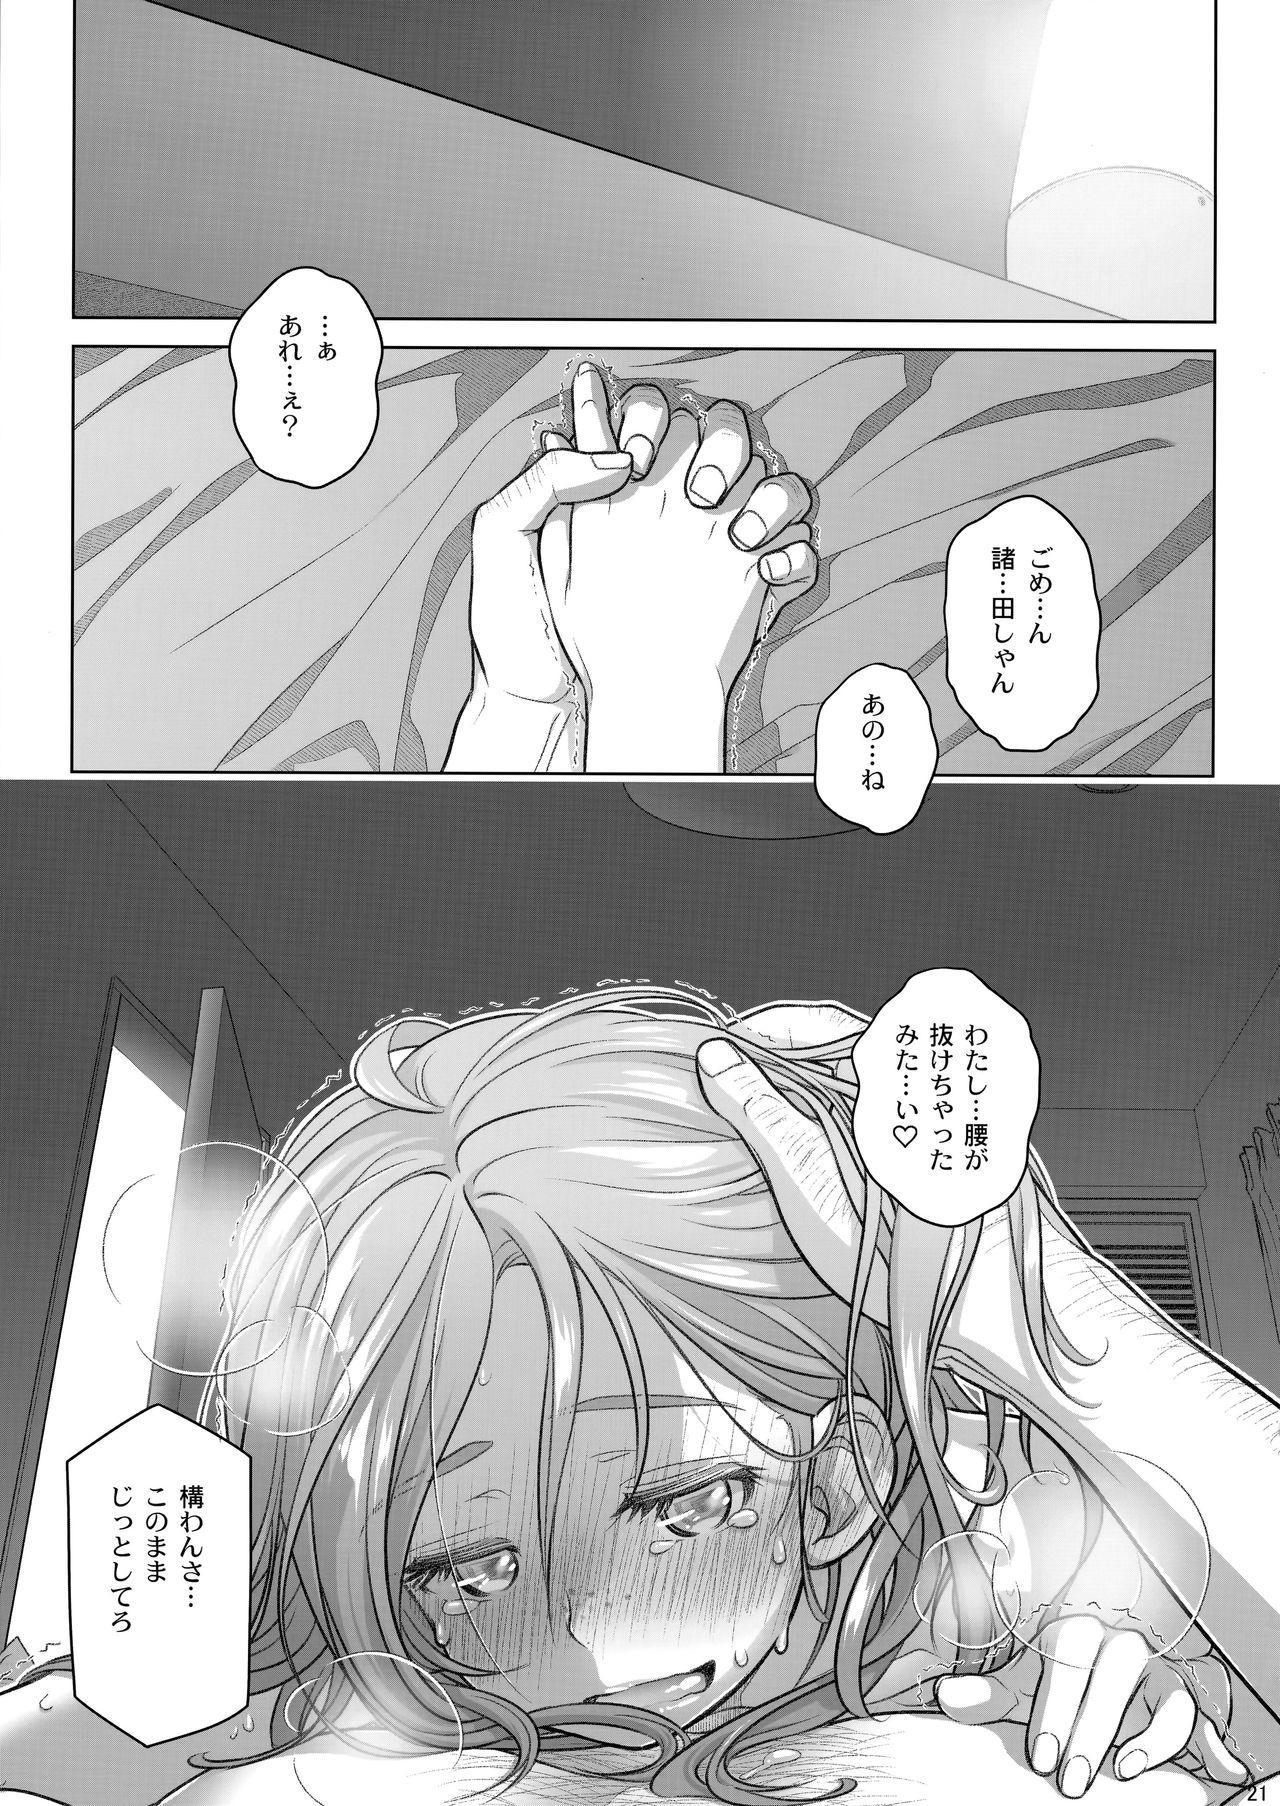 Sorako no Tabi 8 20